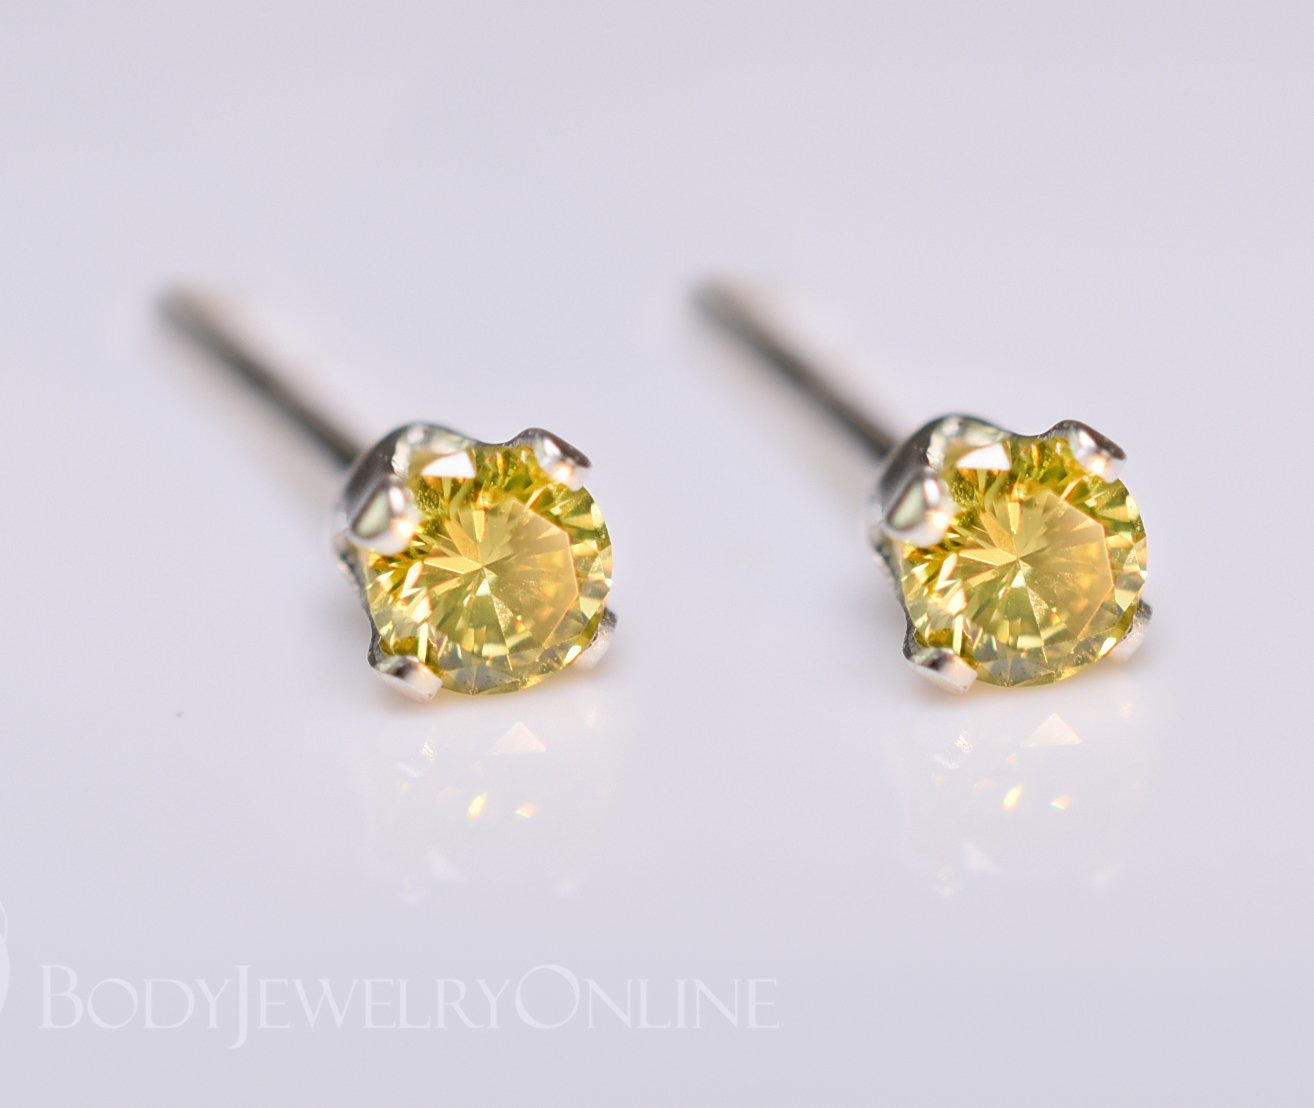 e1c3dad31ca12 Amazon.com: Genuine CANARY YELLOW DIAMOND Earring Studs 2mm 0.08tcw ...